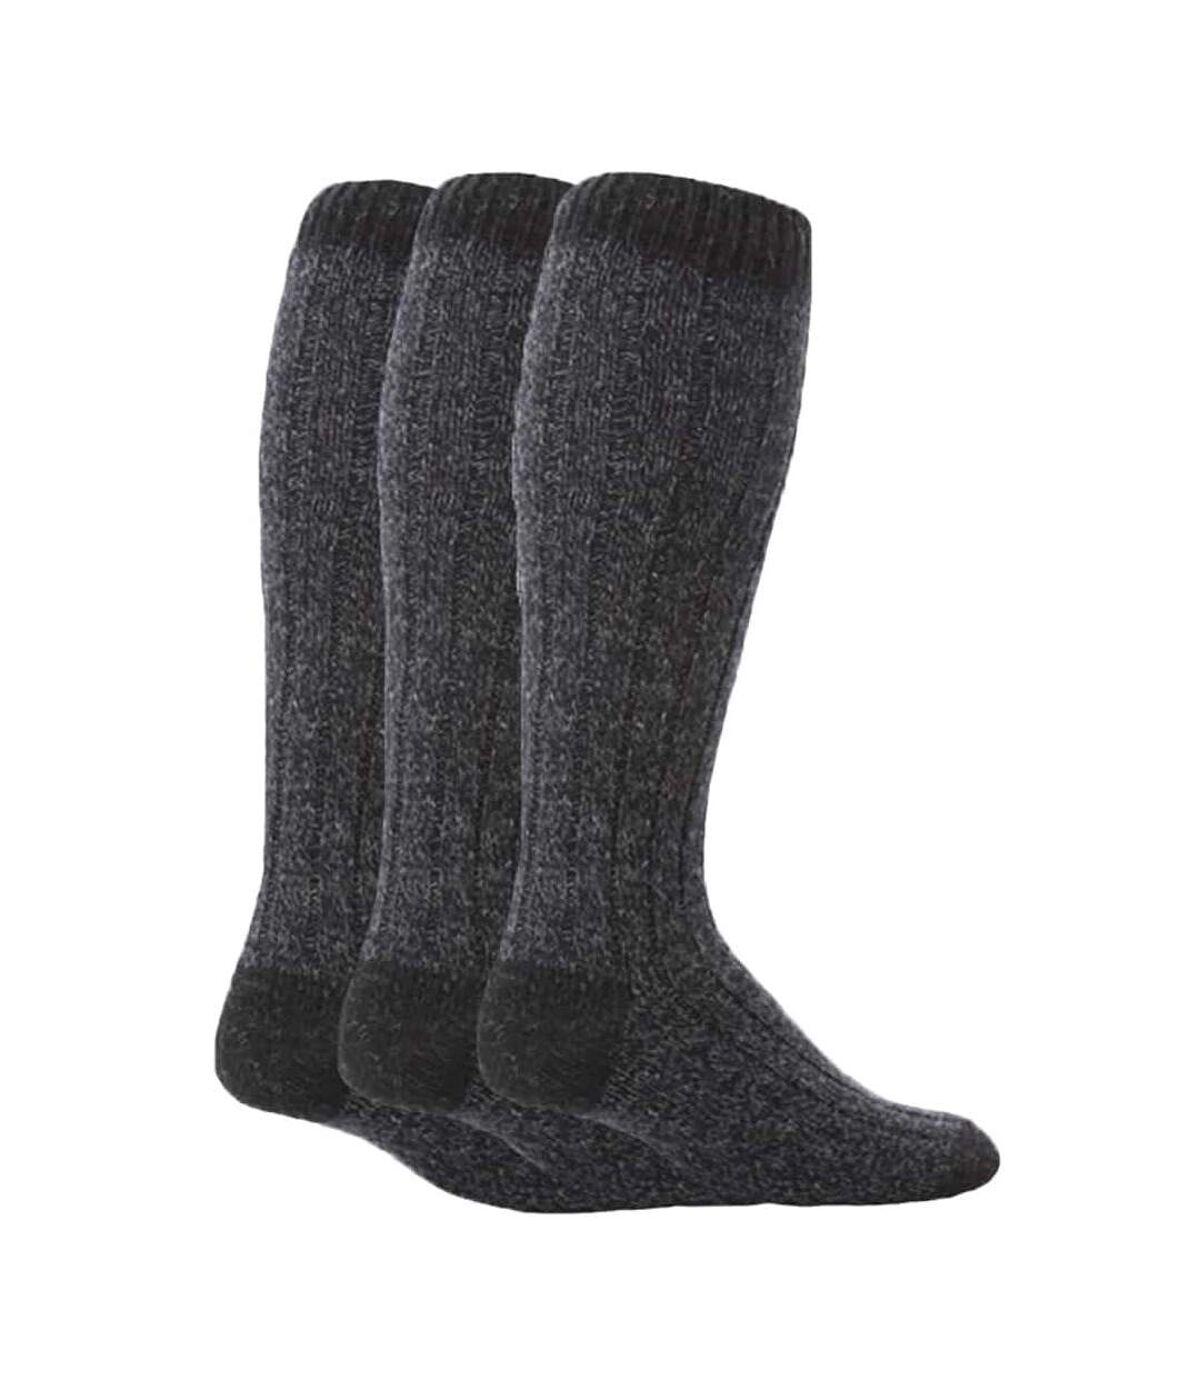 3 Pk Mens Extra Long Knee High Wool Boot Socks